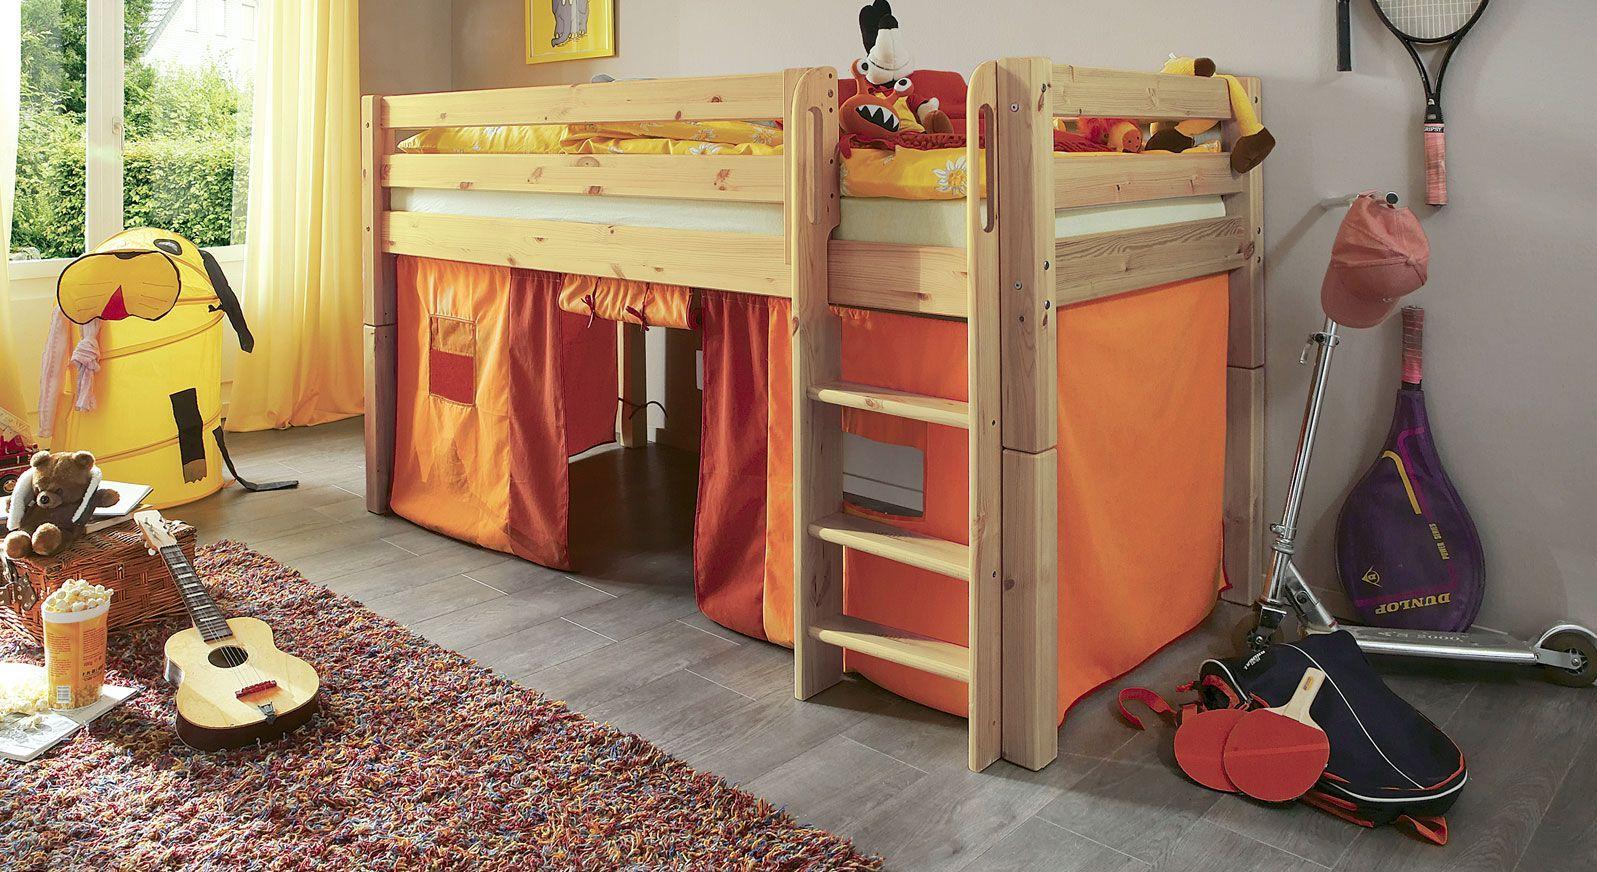 Mini-Hochbett Kids paradise Spielvorhang